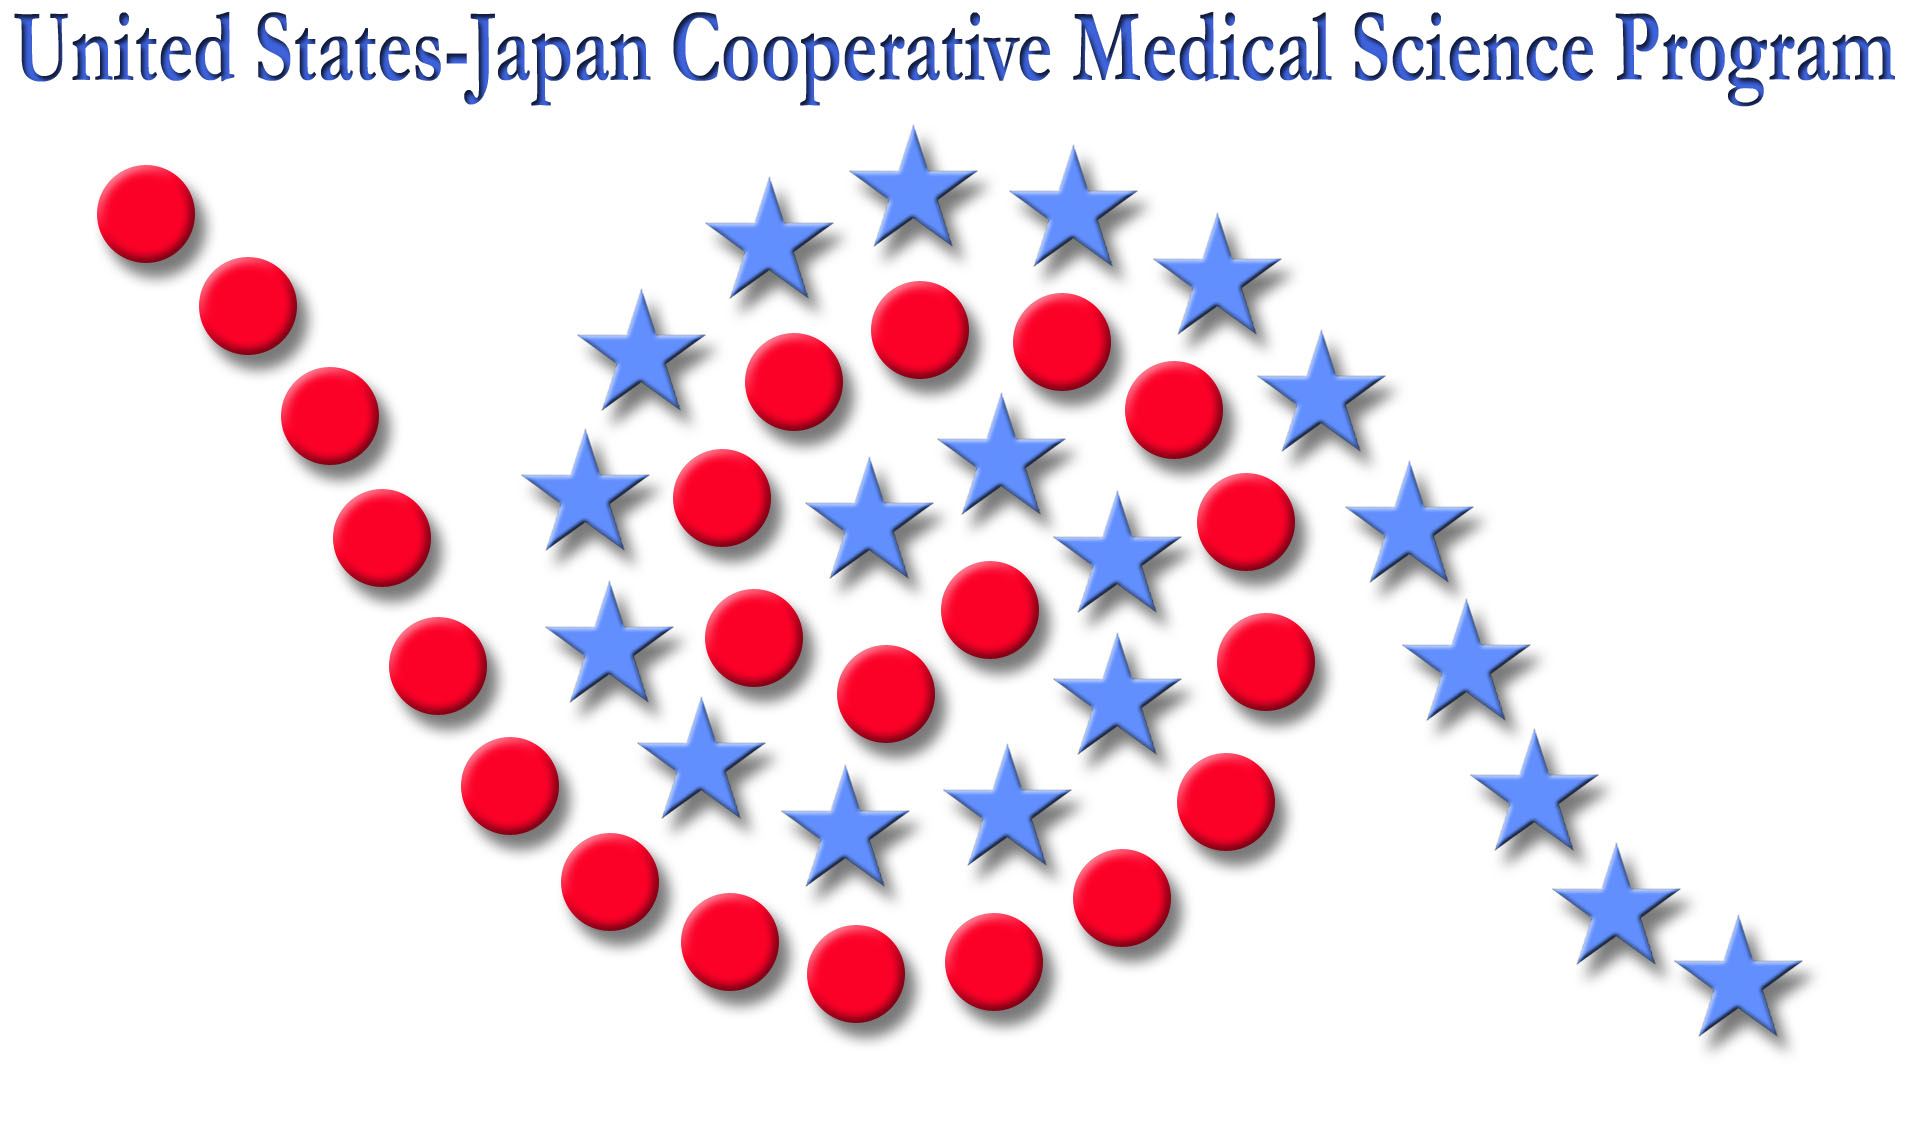 USJCMSP logo5 title